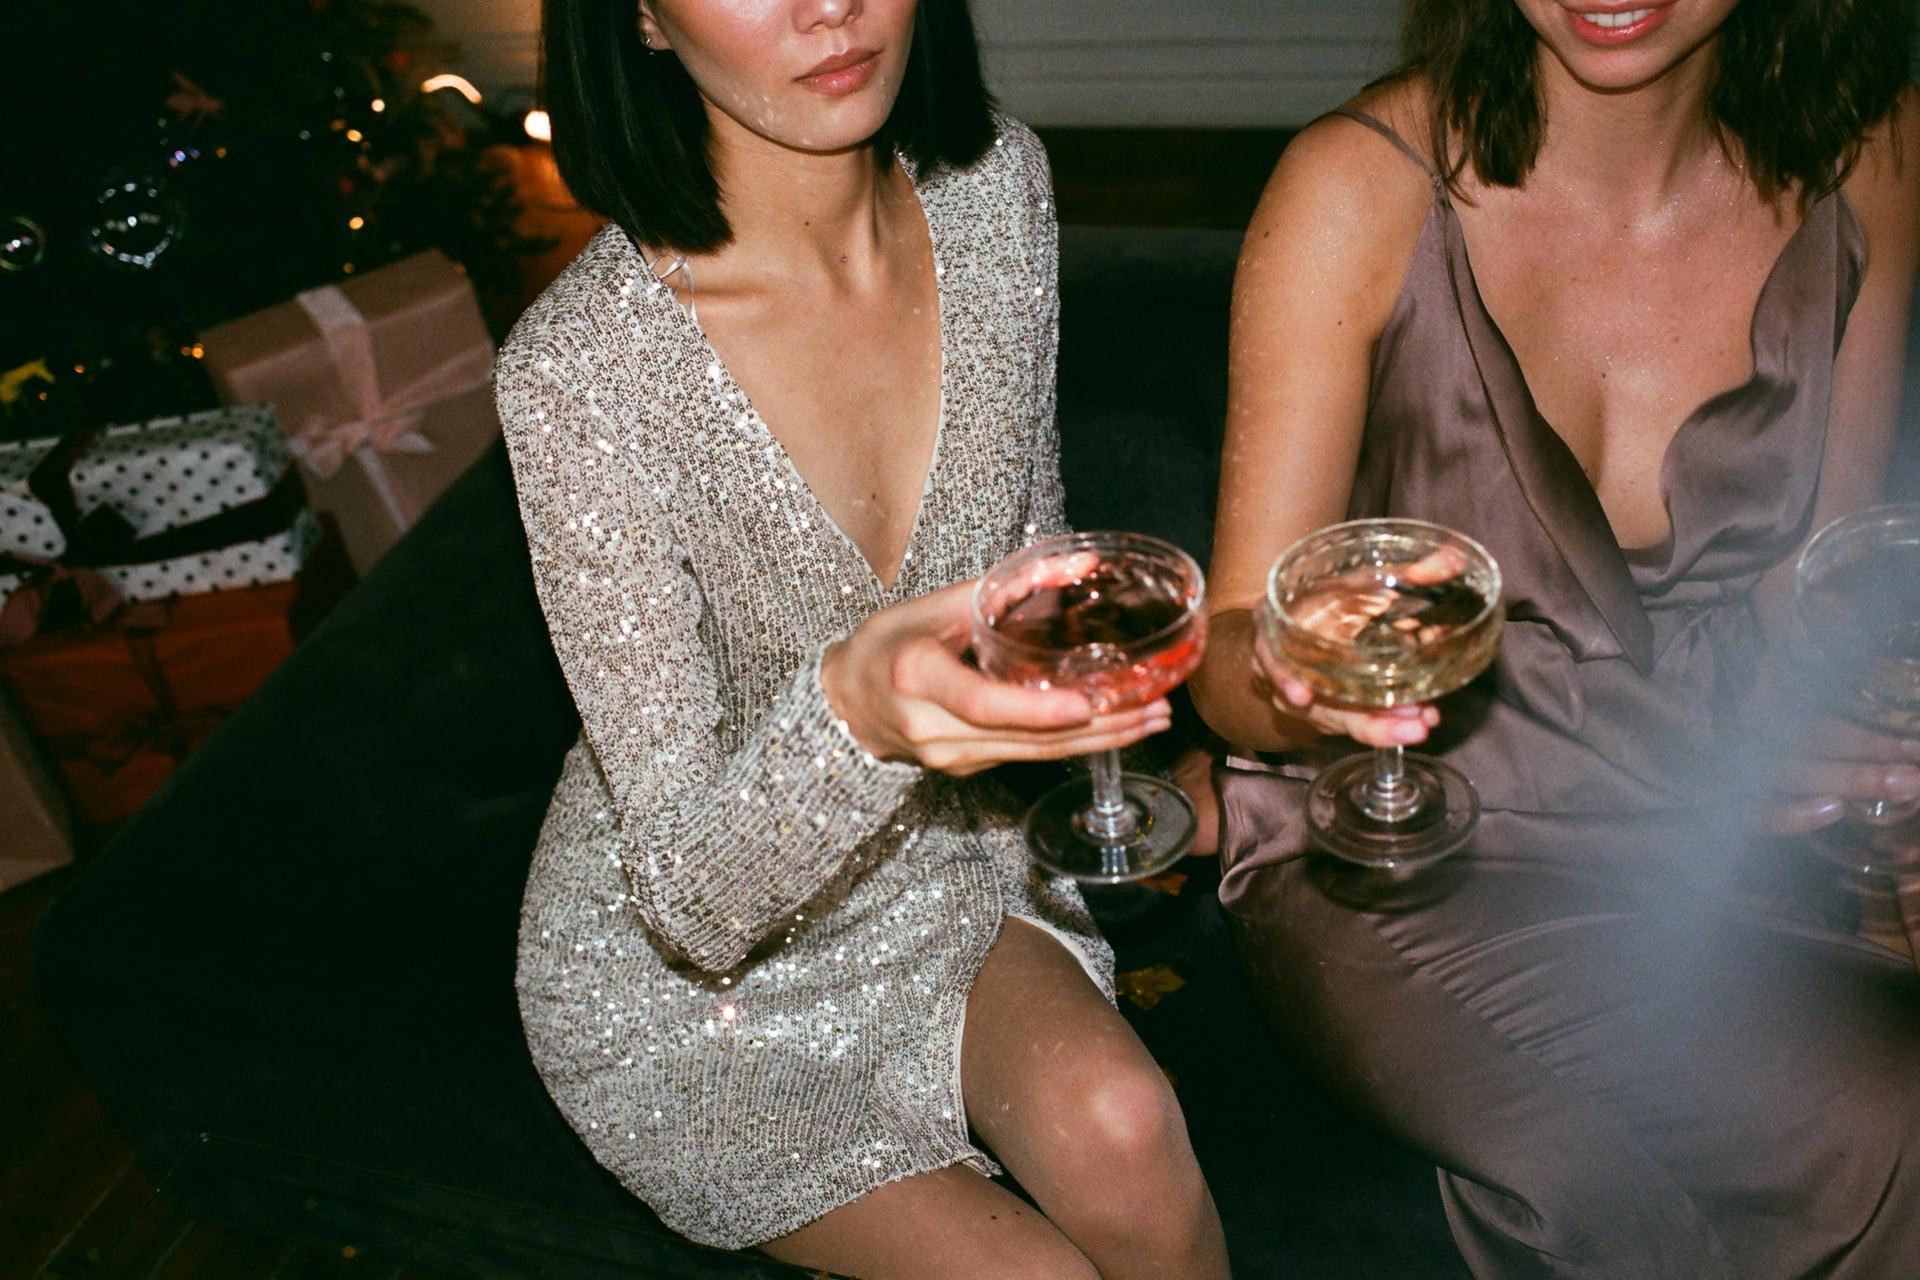 Two Women Holding Wine Glasses